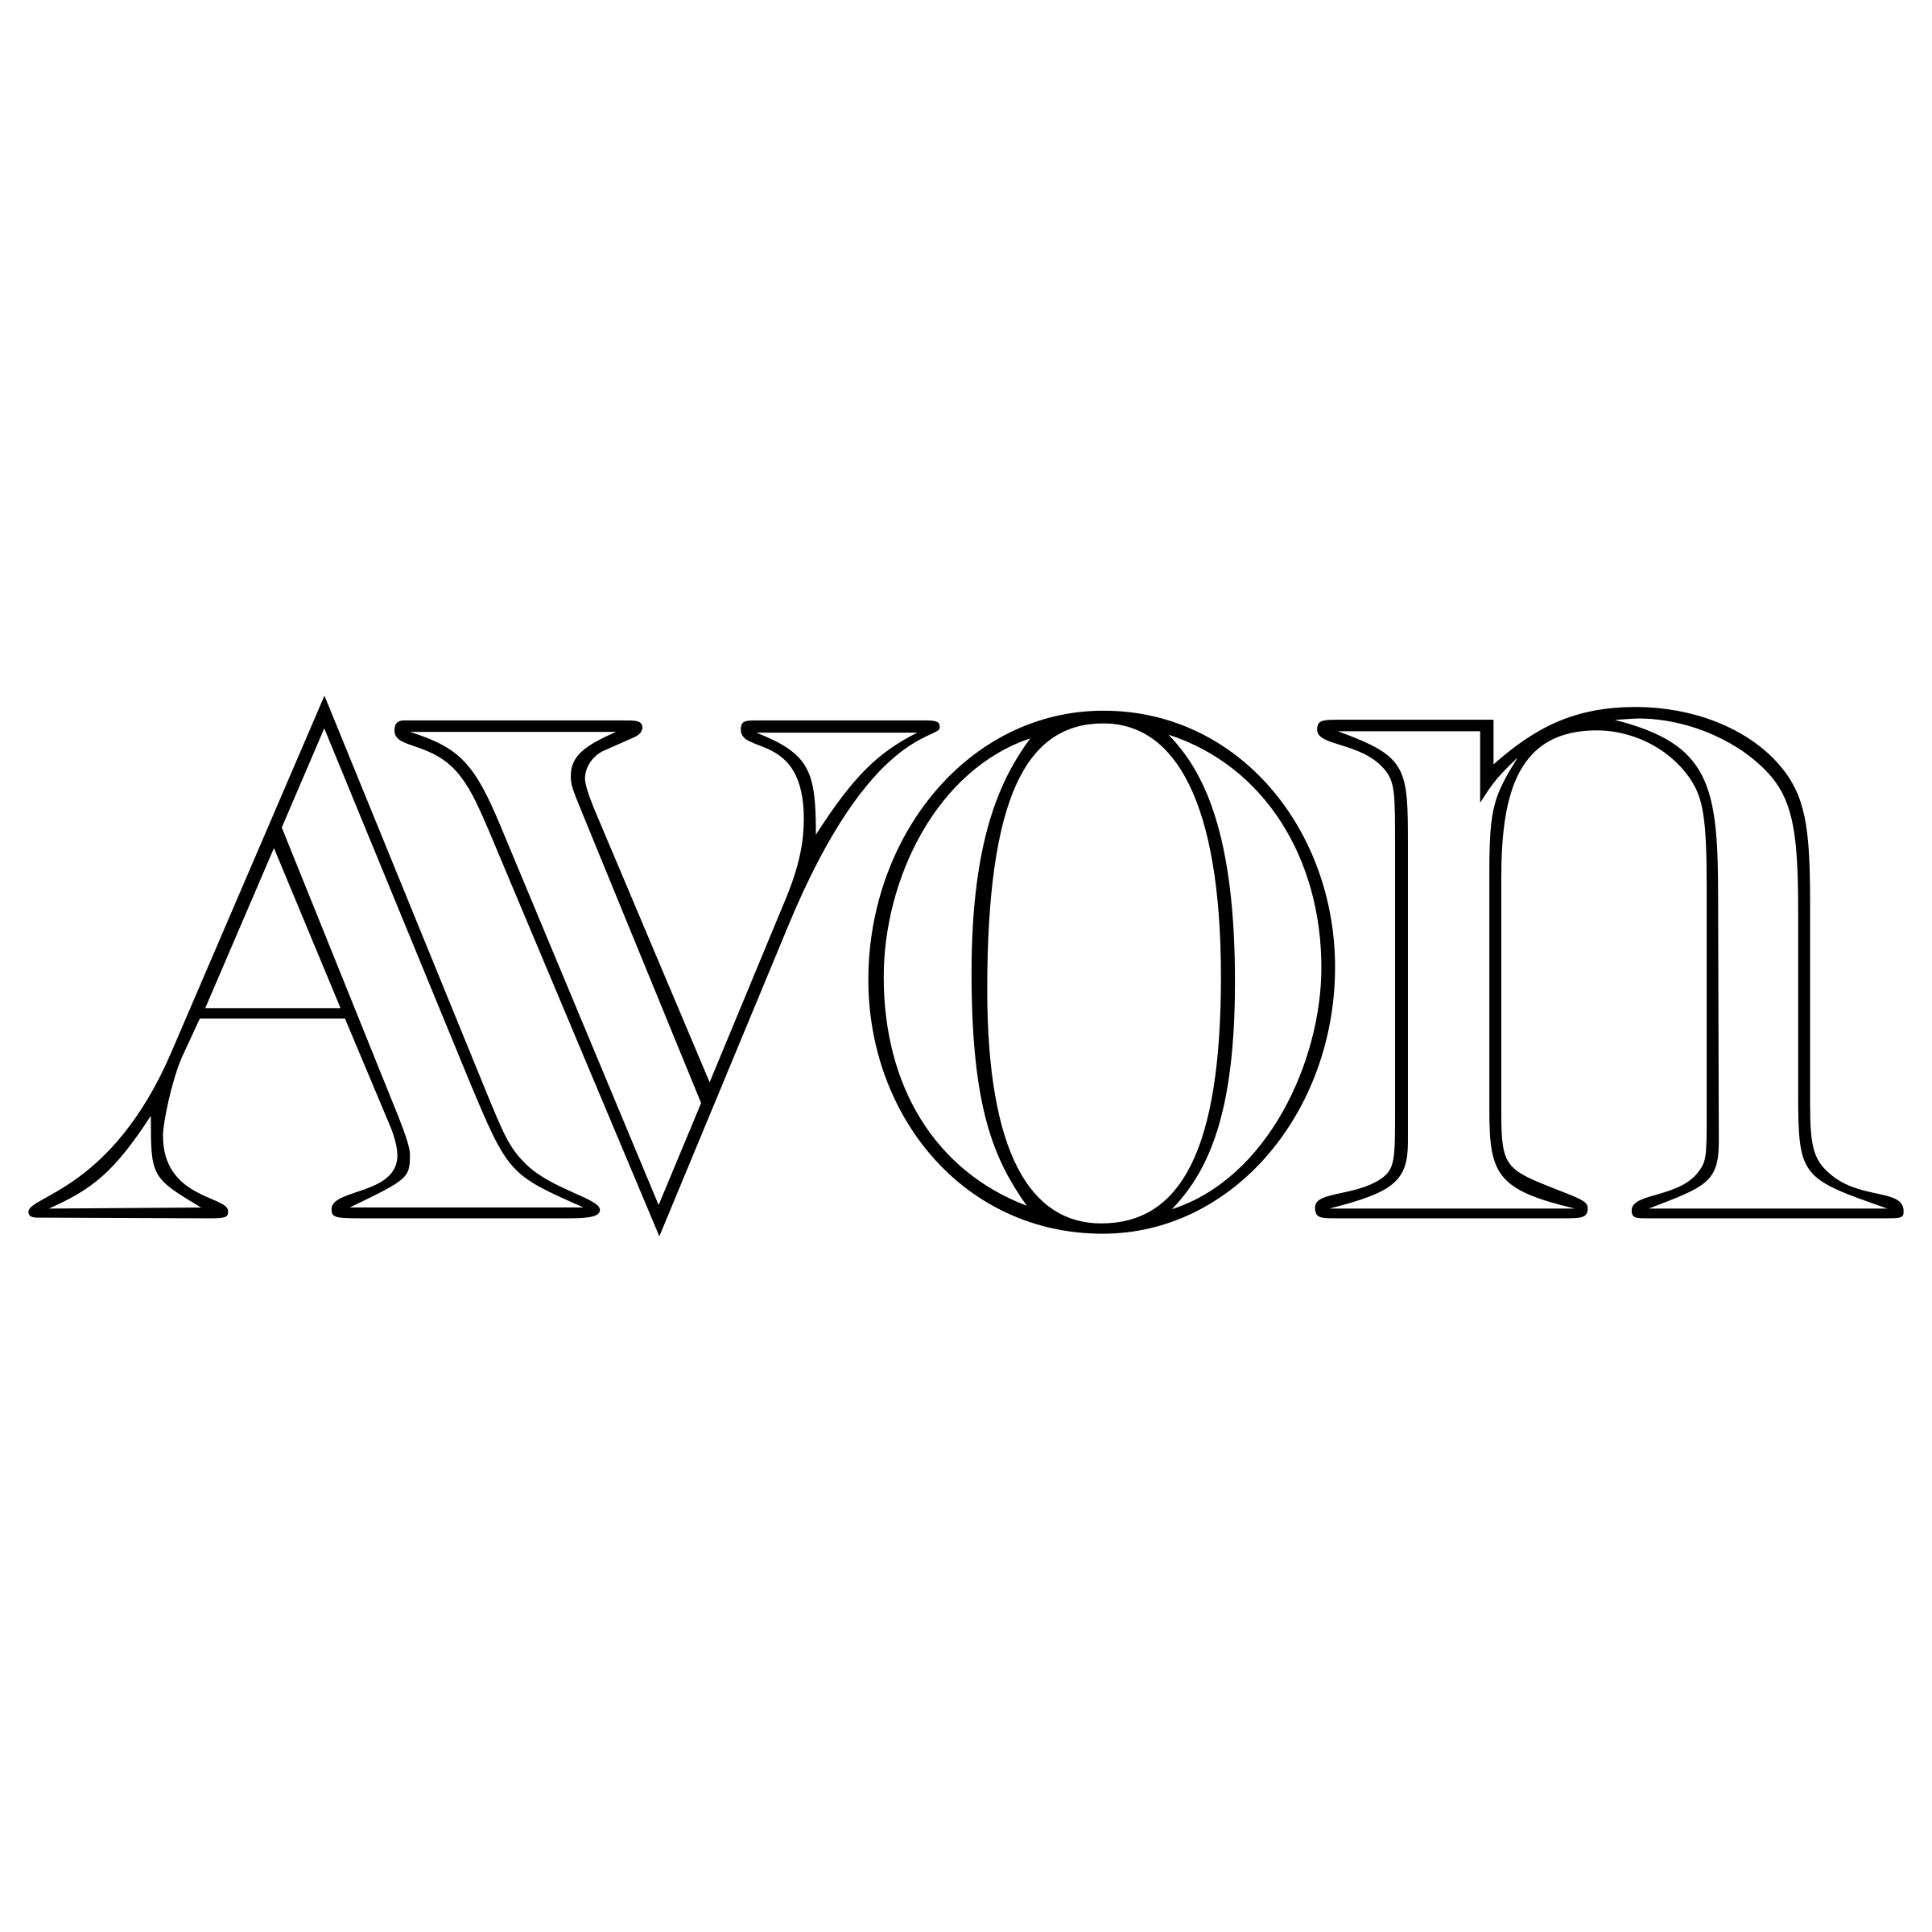 Avon 02 Logo PNG Transparent & SVG Vector.